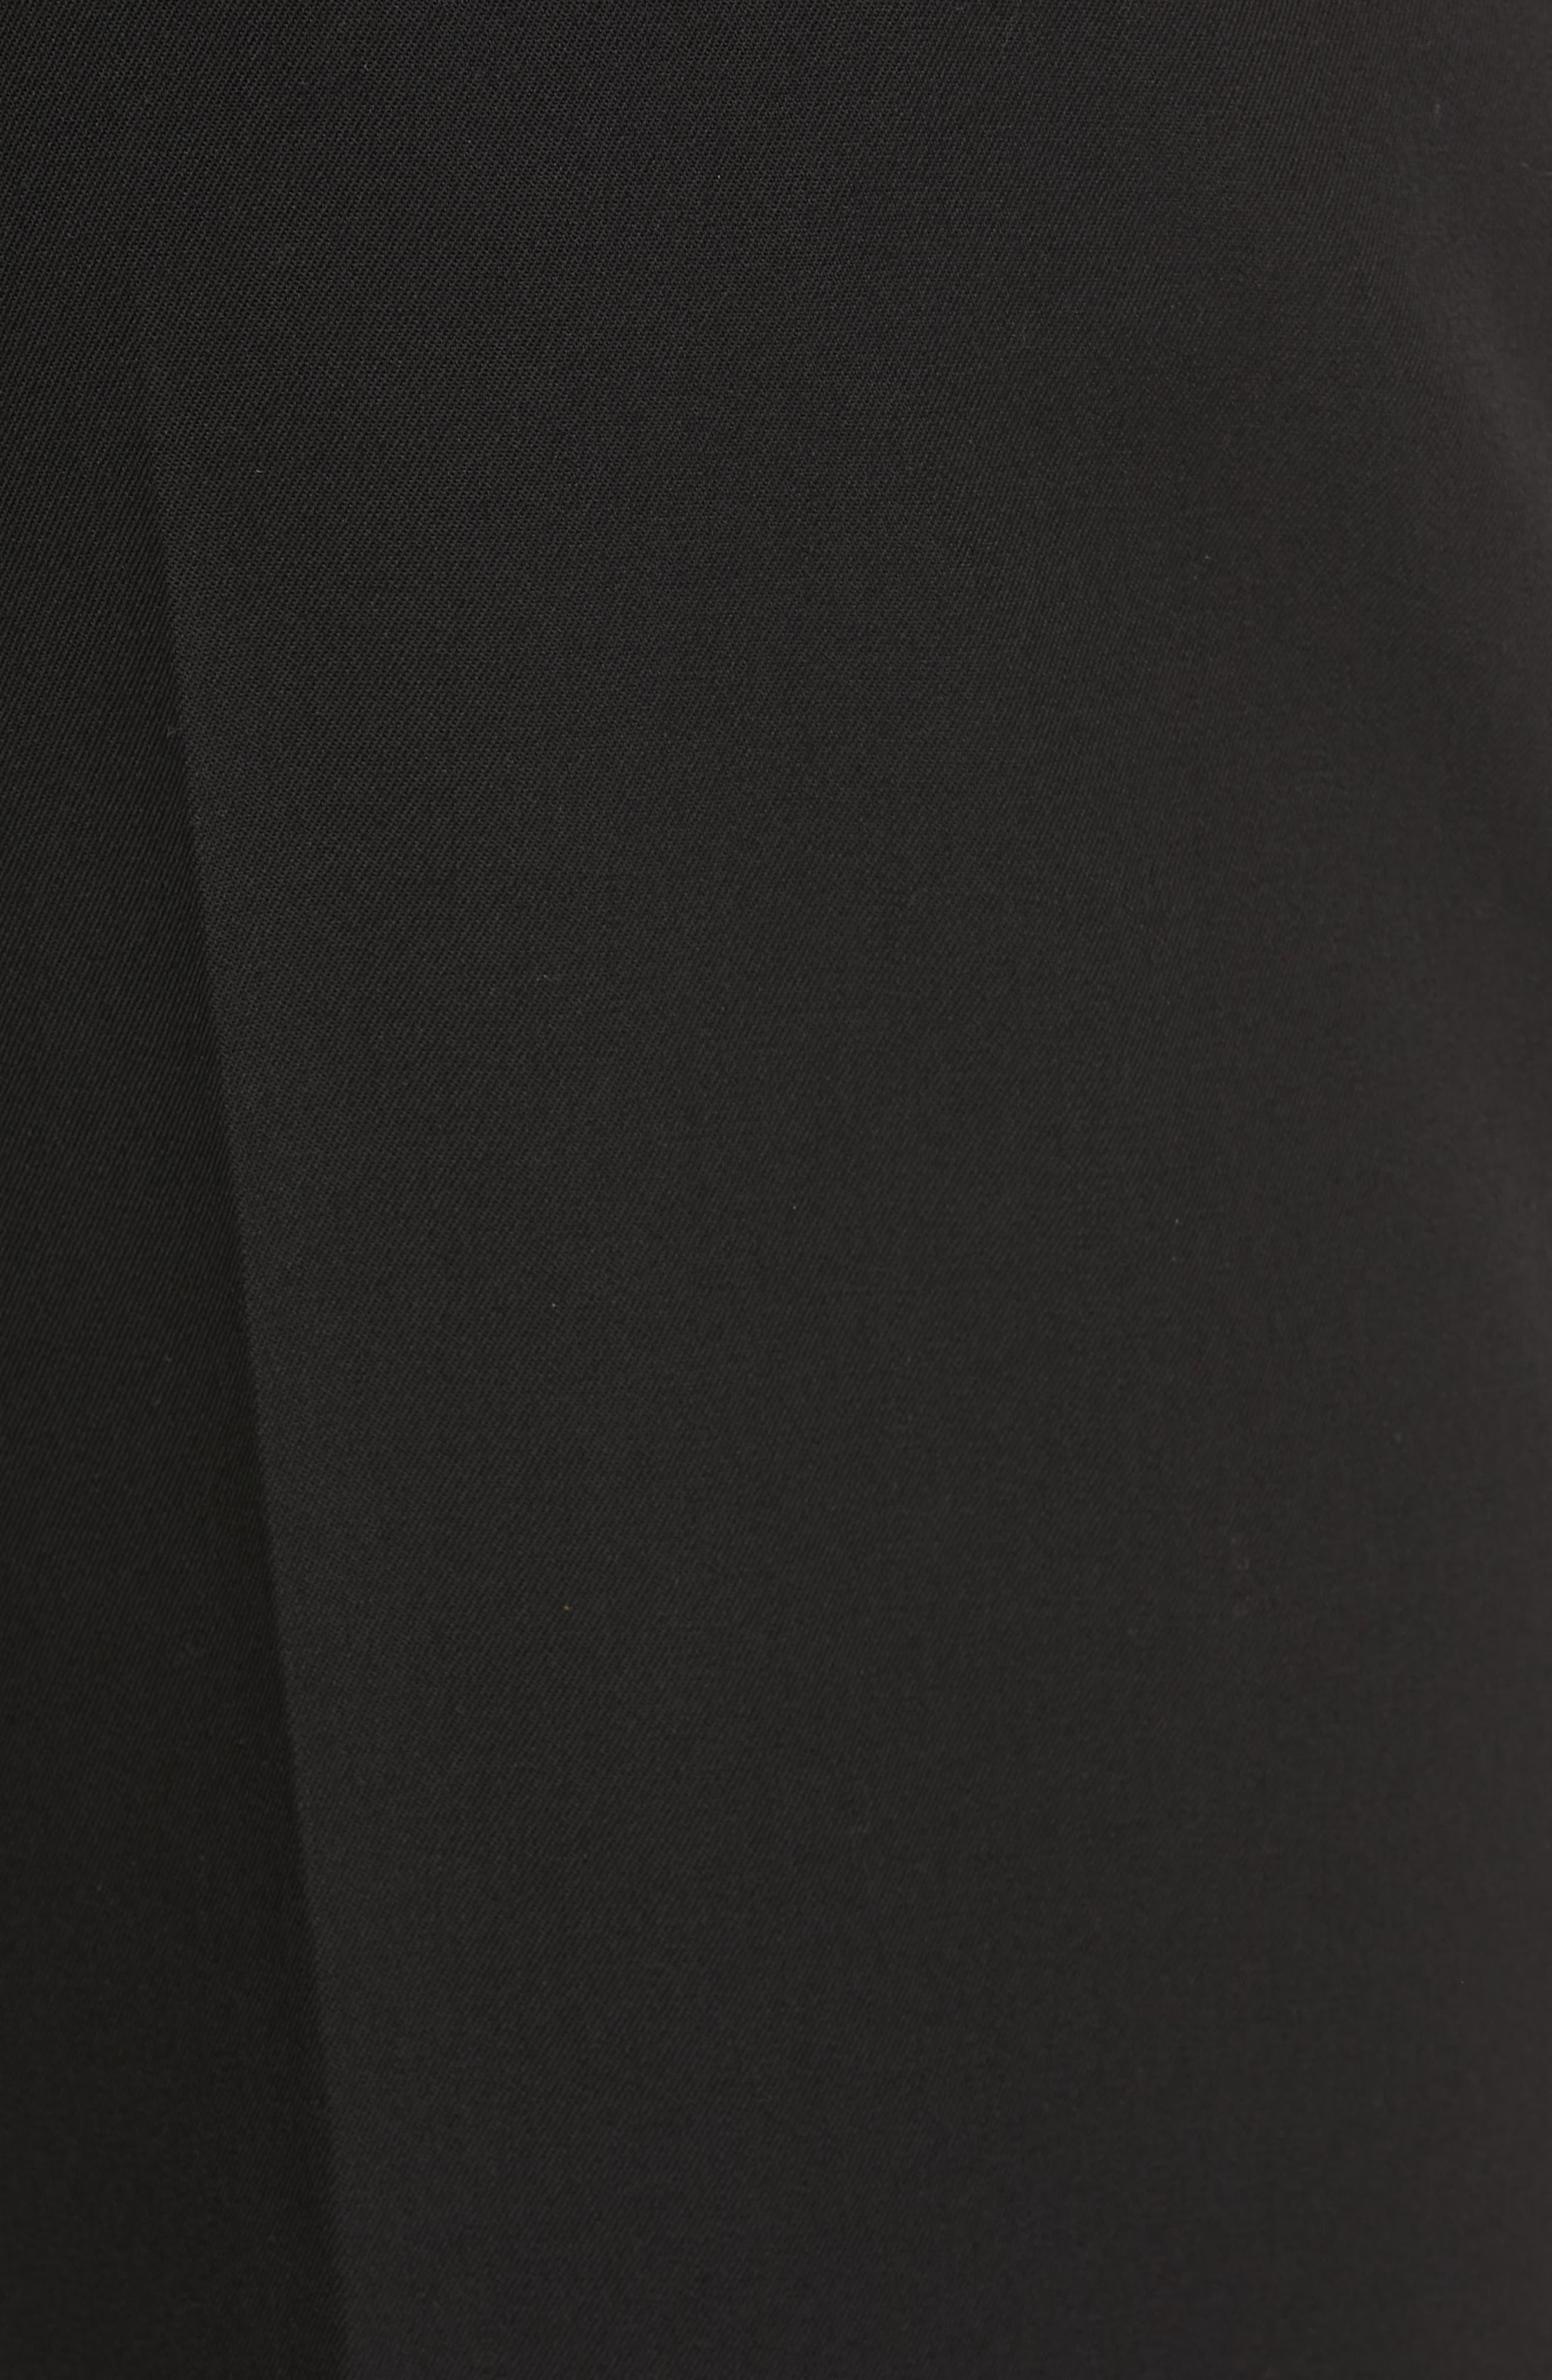 CALVIN KLEIN 205W39NYC, Pleated Gabardine Wool Trousers, Alternate thumbnail 5, color, BLACK